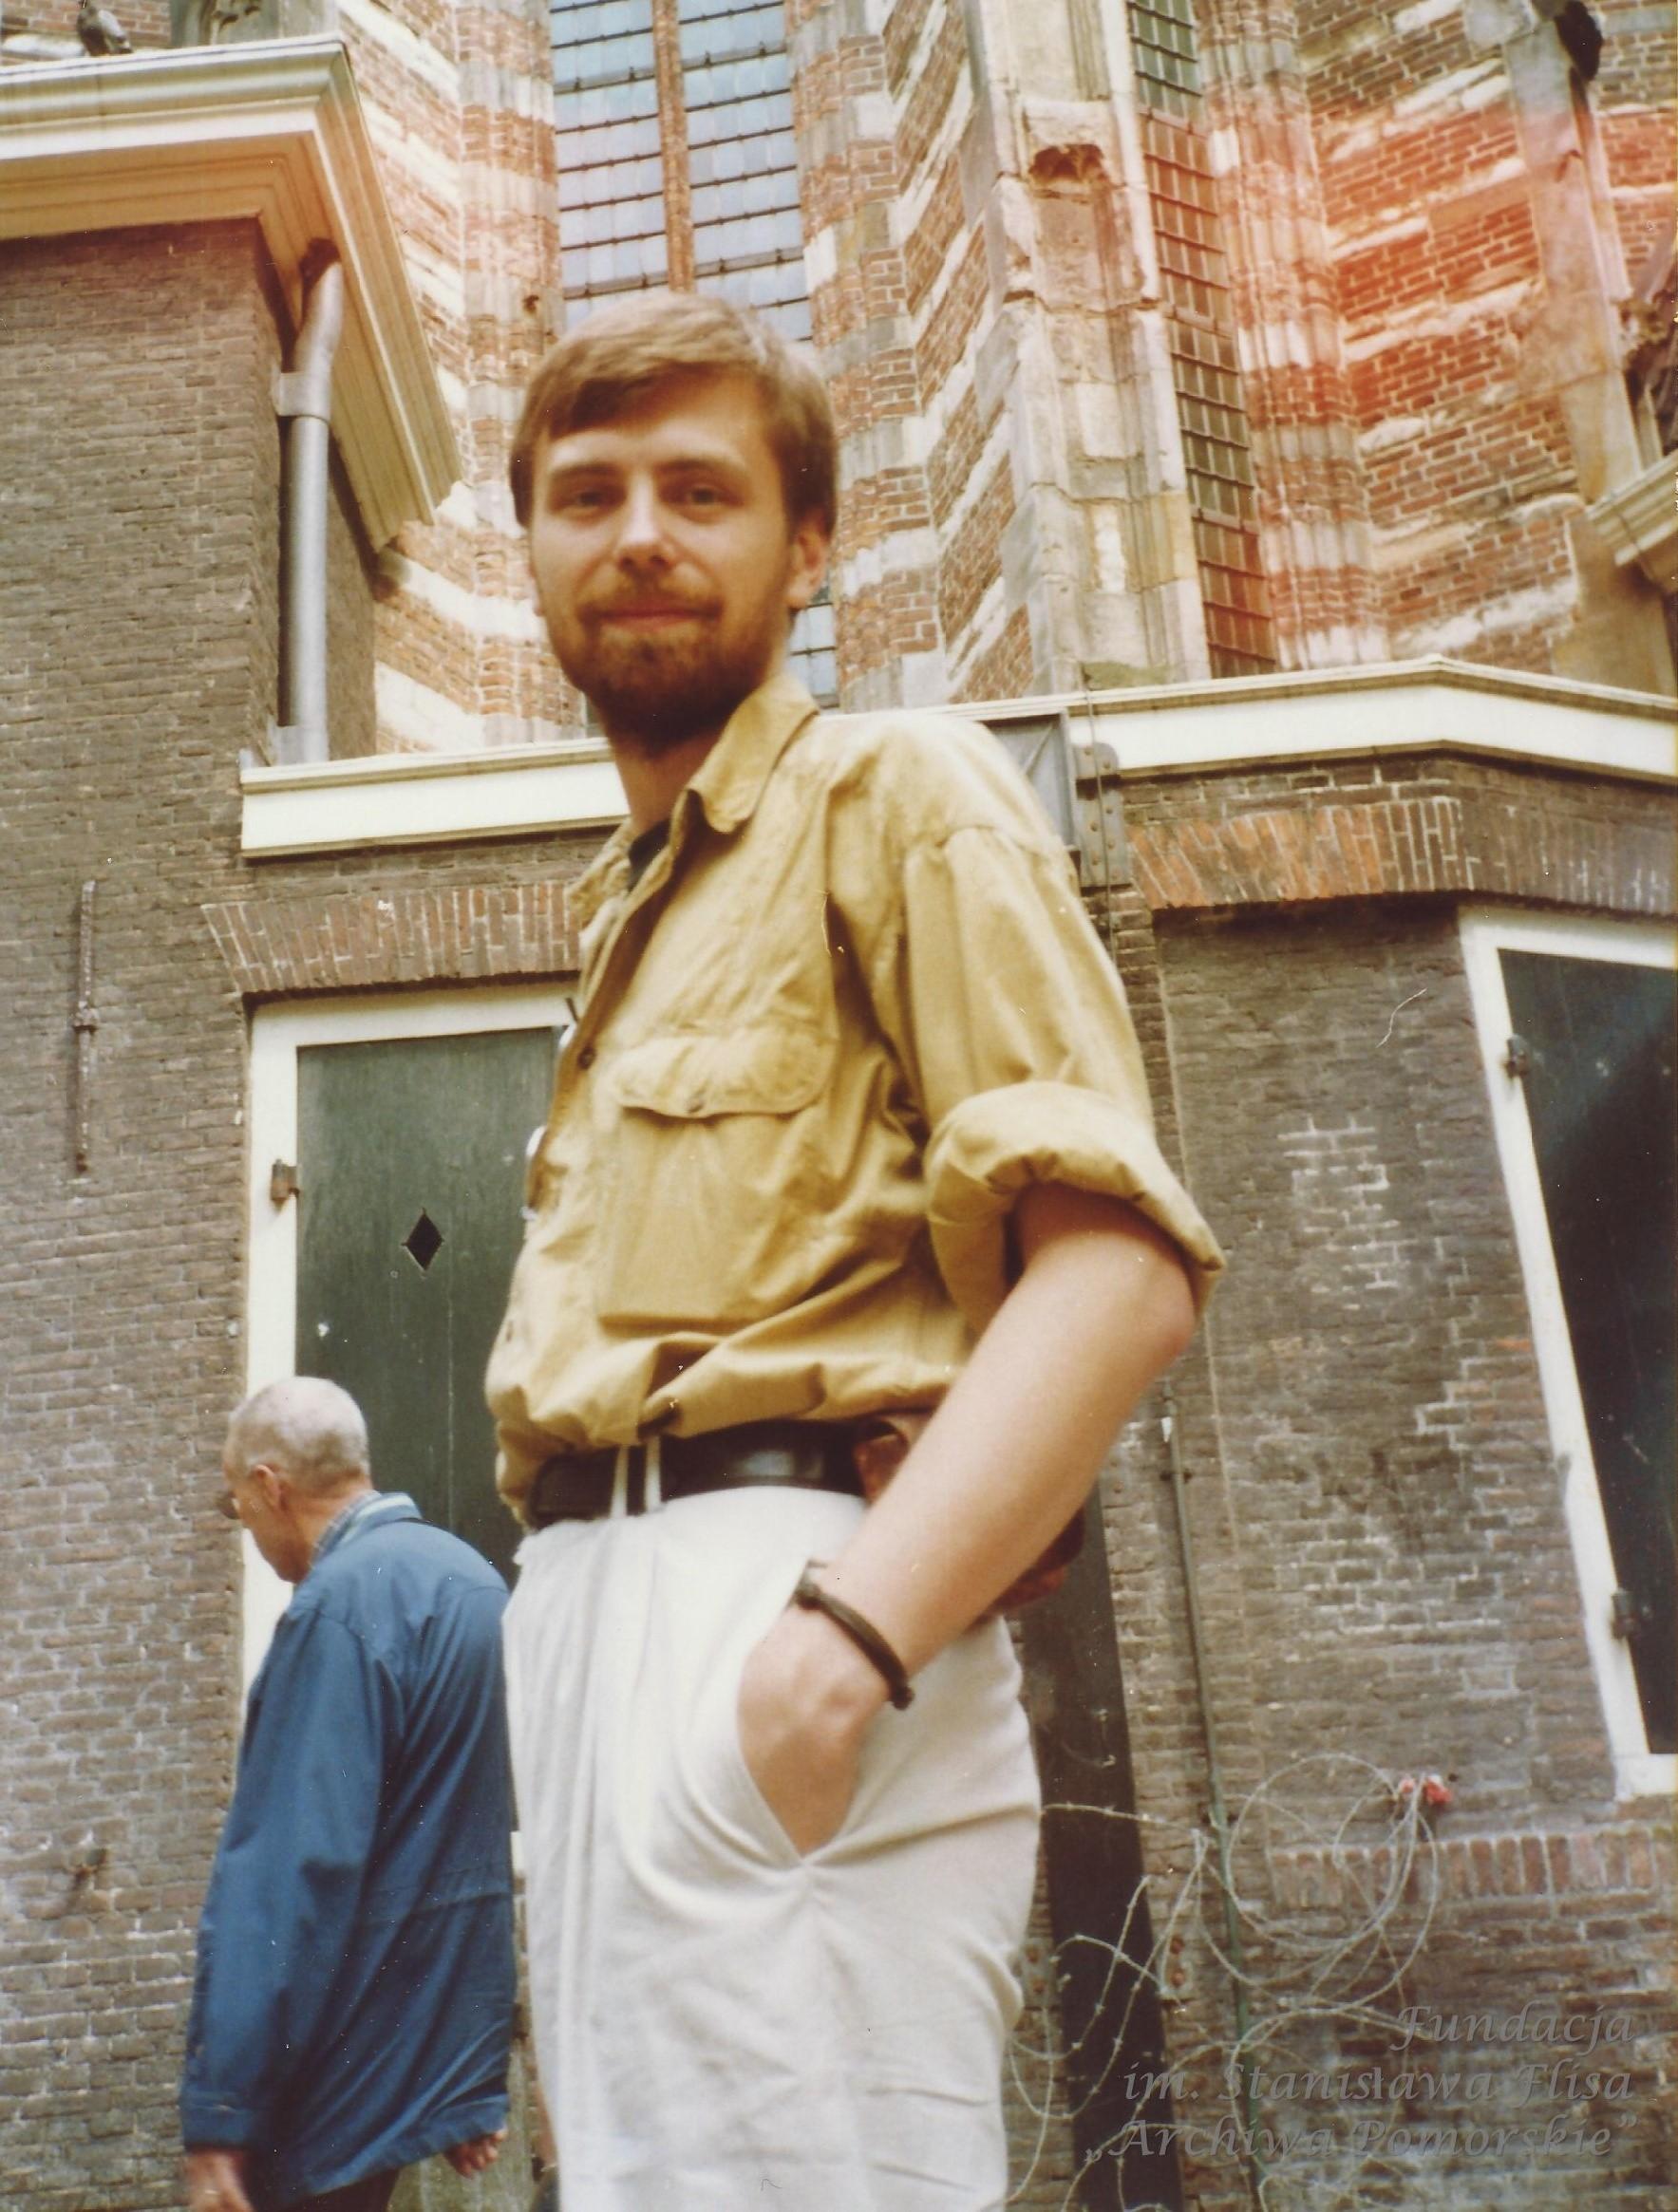 1993 r. W Amsterdamie